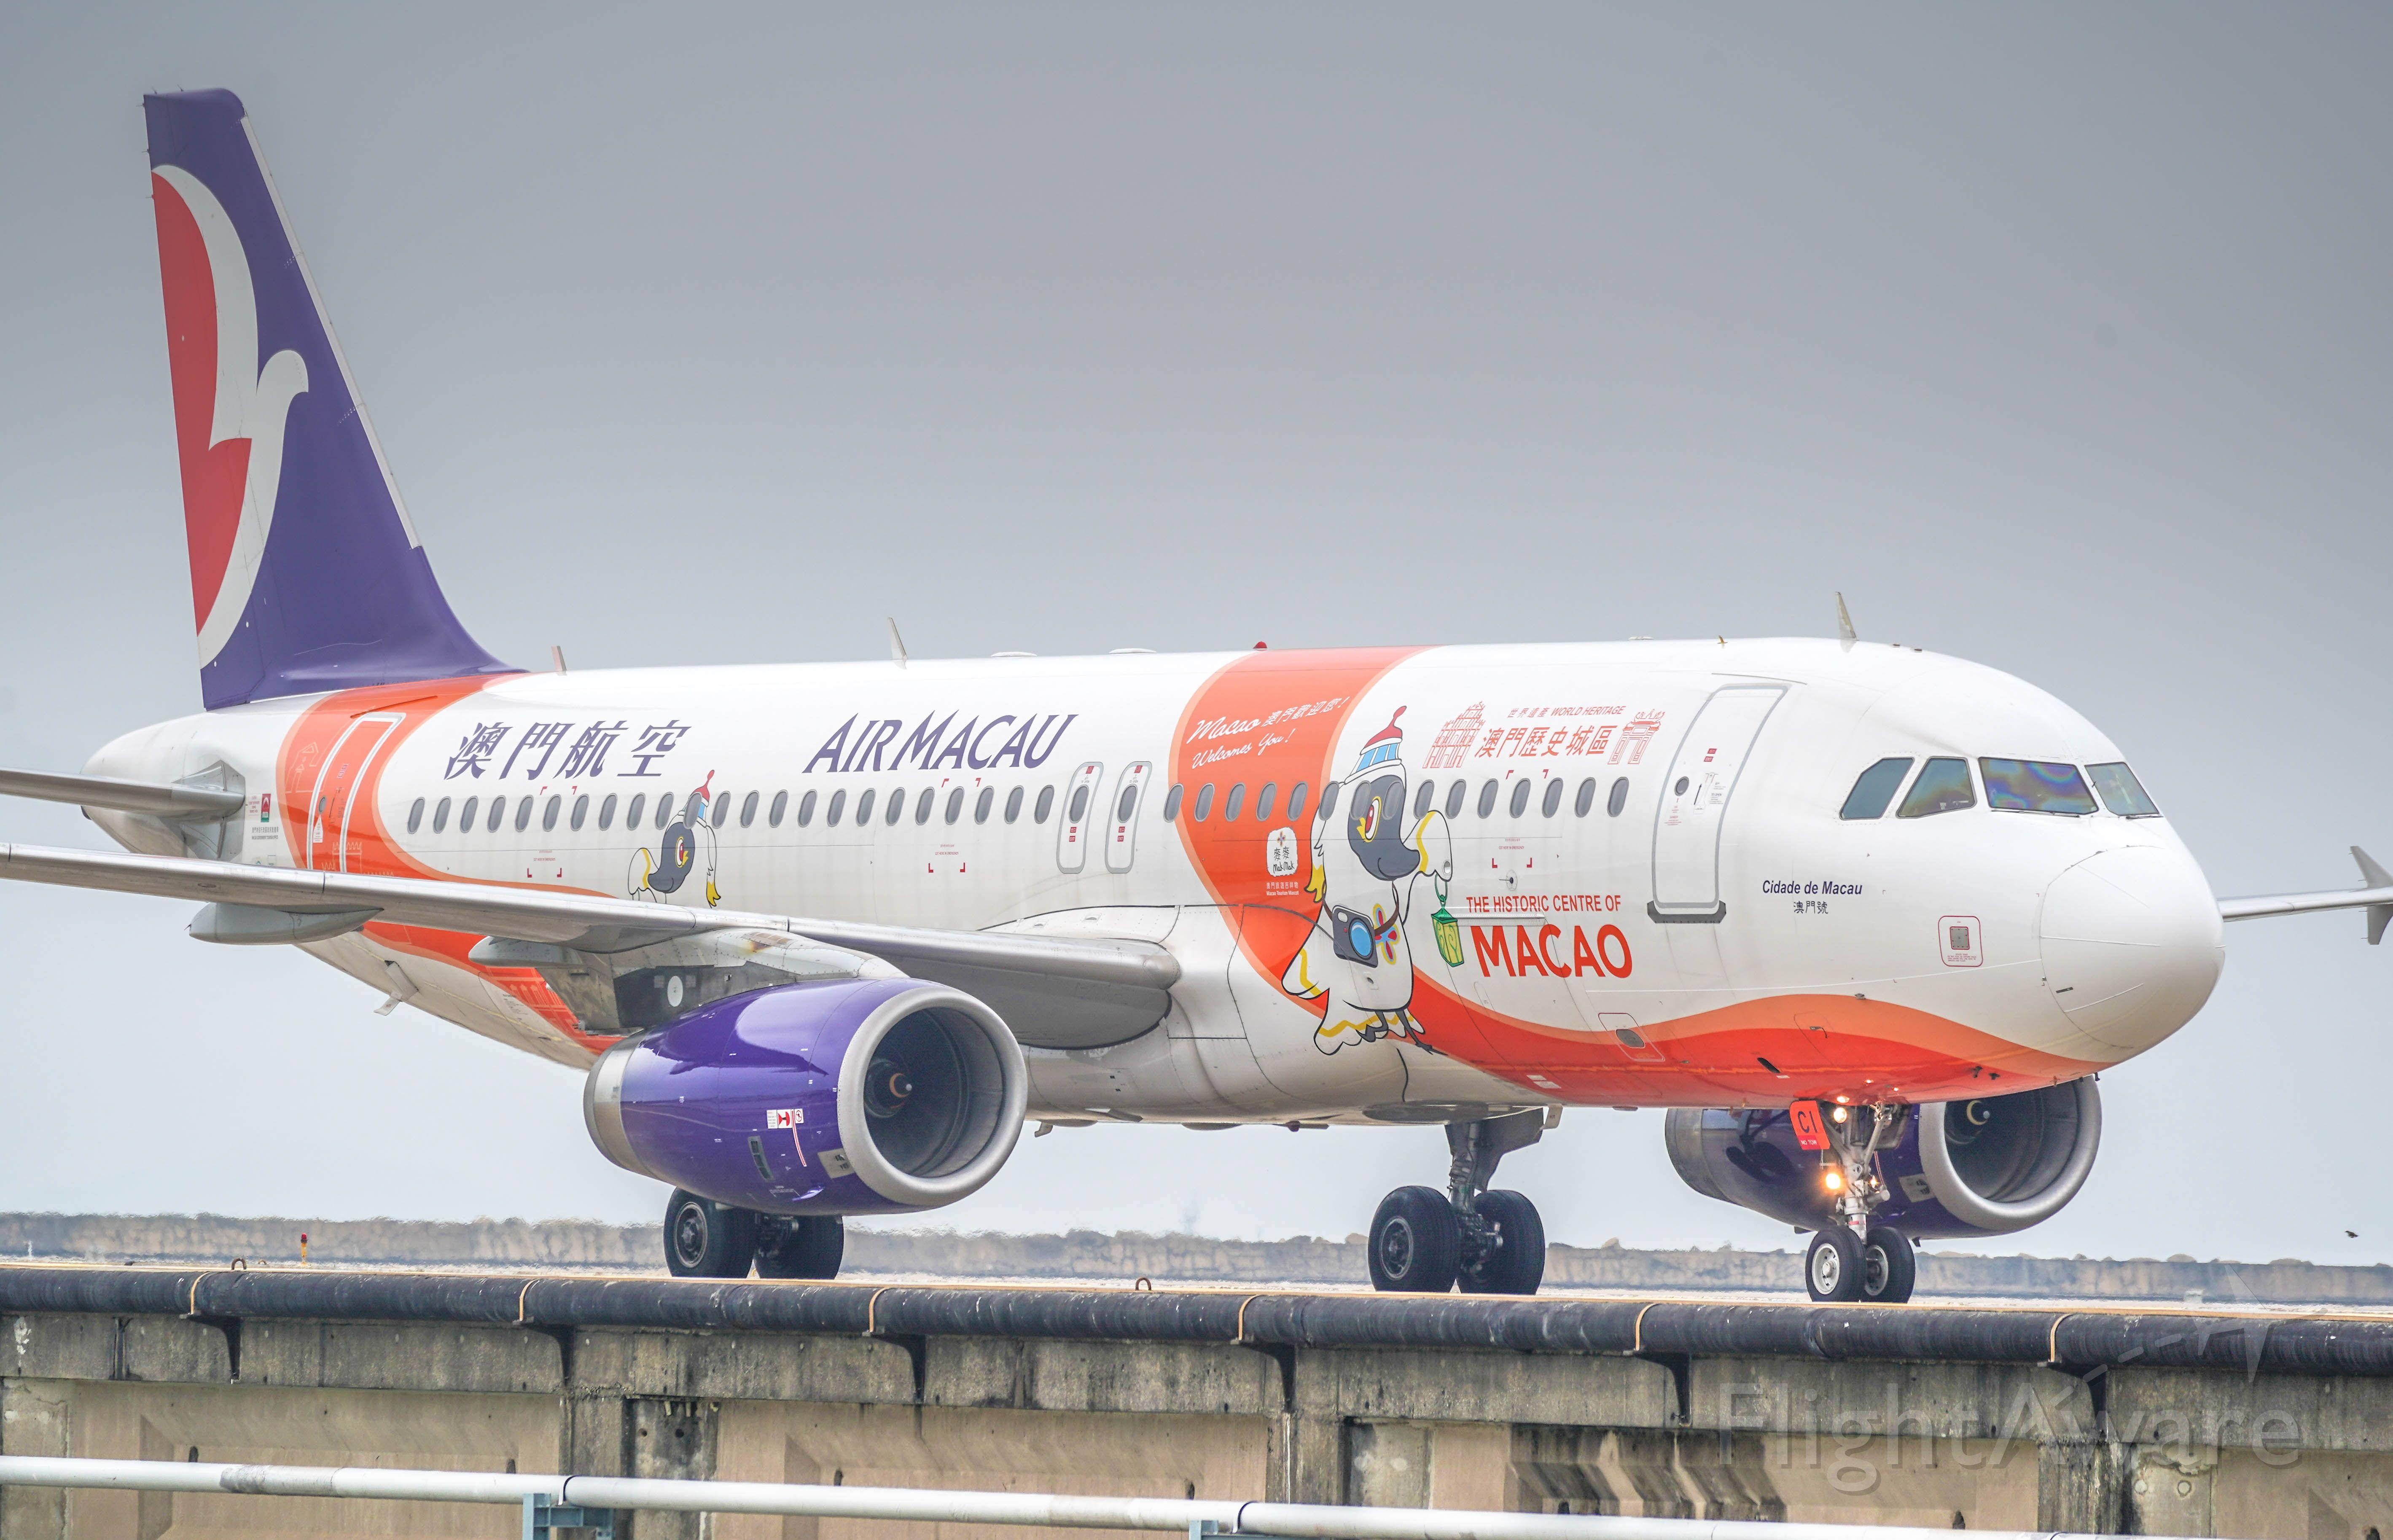 Airbus A320 (B-MCI)